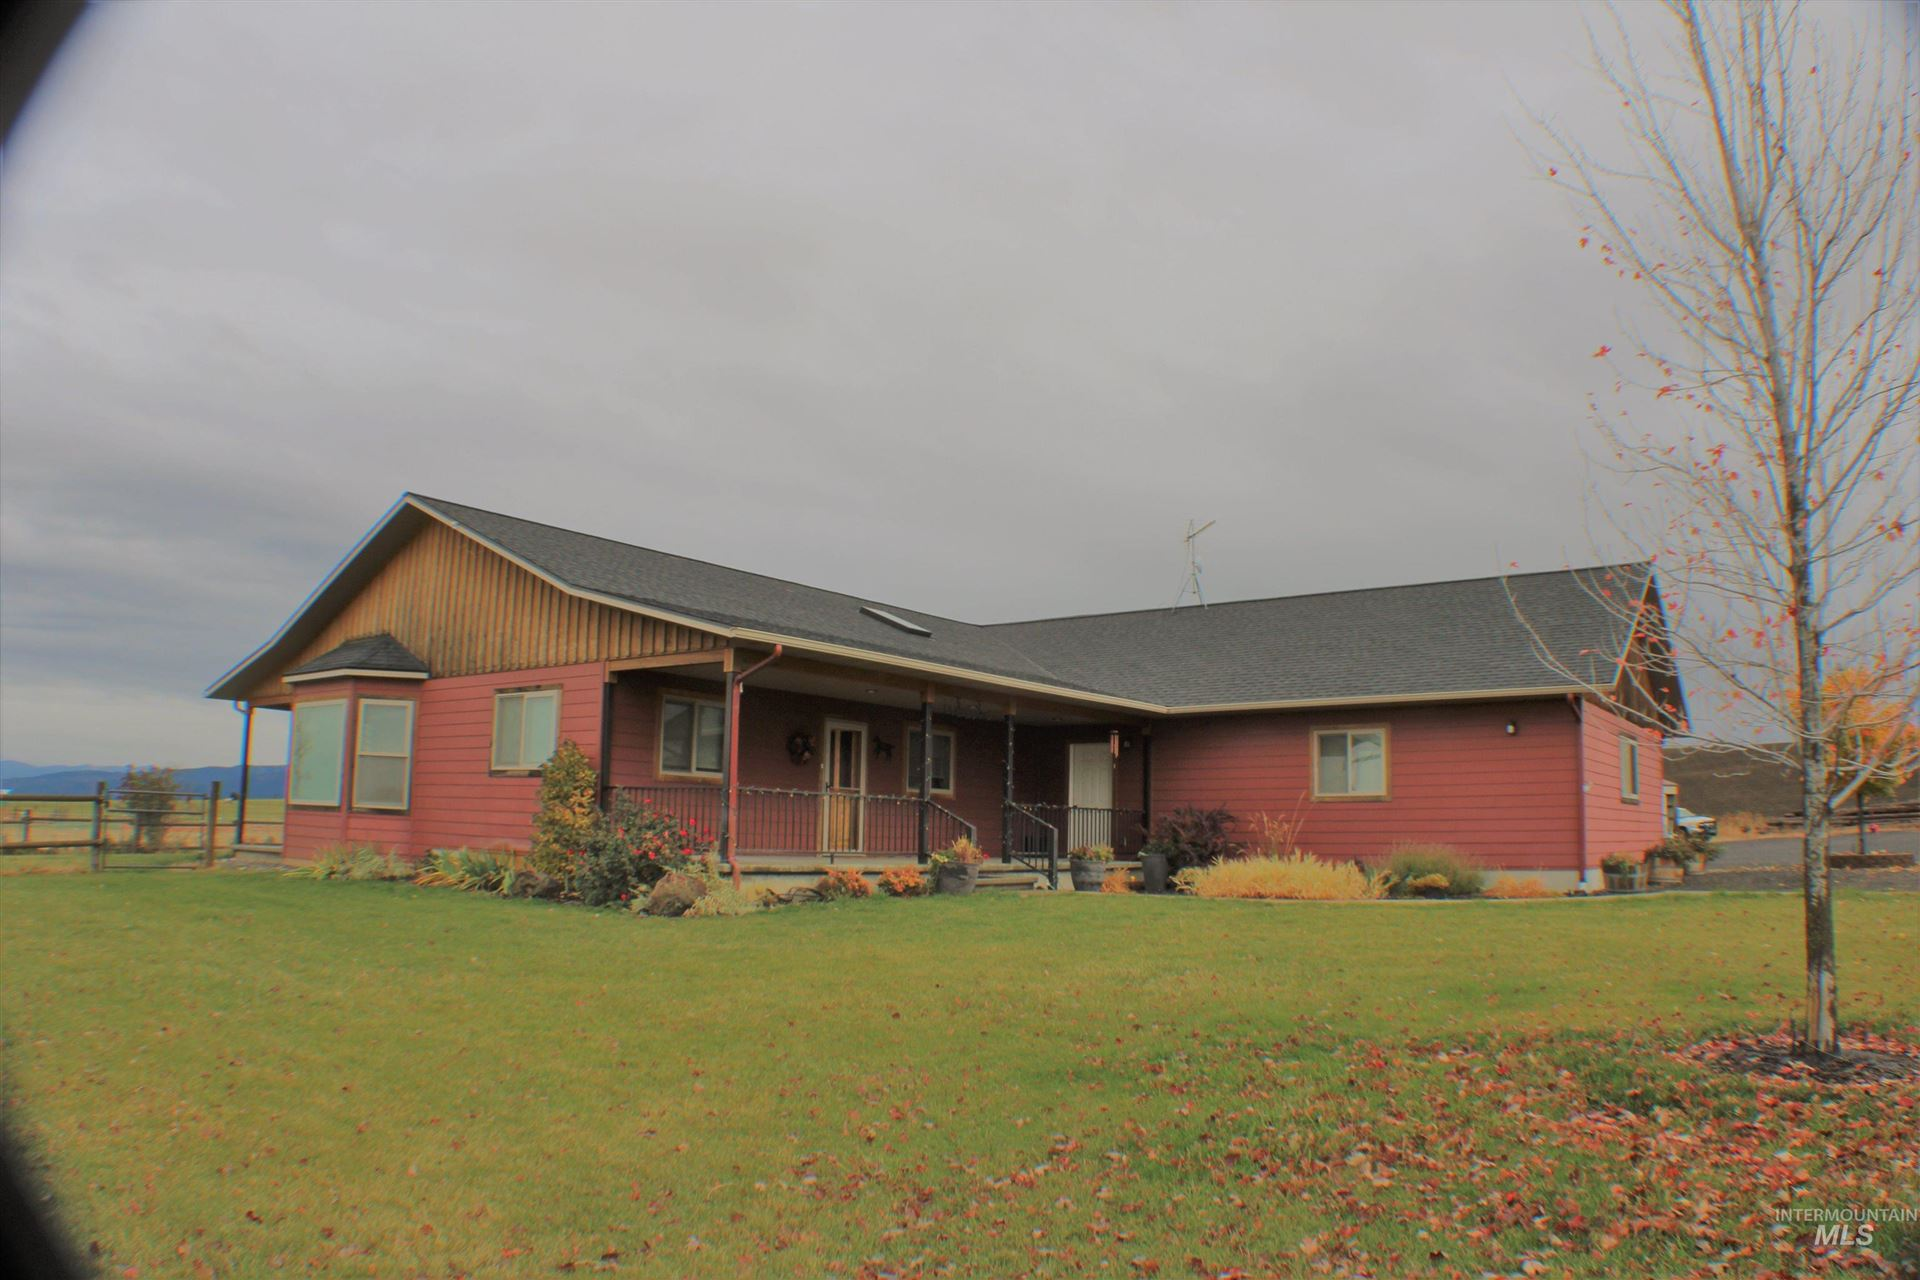 Photo of 272 Fairview Road, Grangeville, ID 83530-0000 (MLS # 98823647)